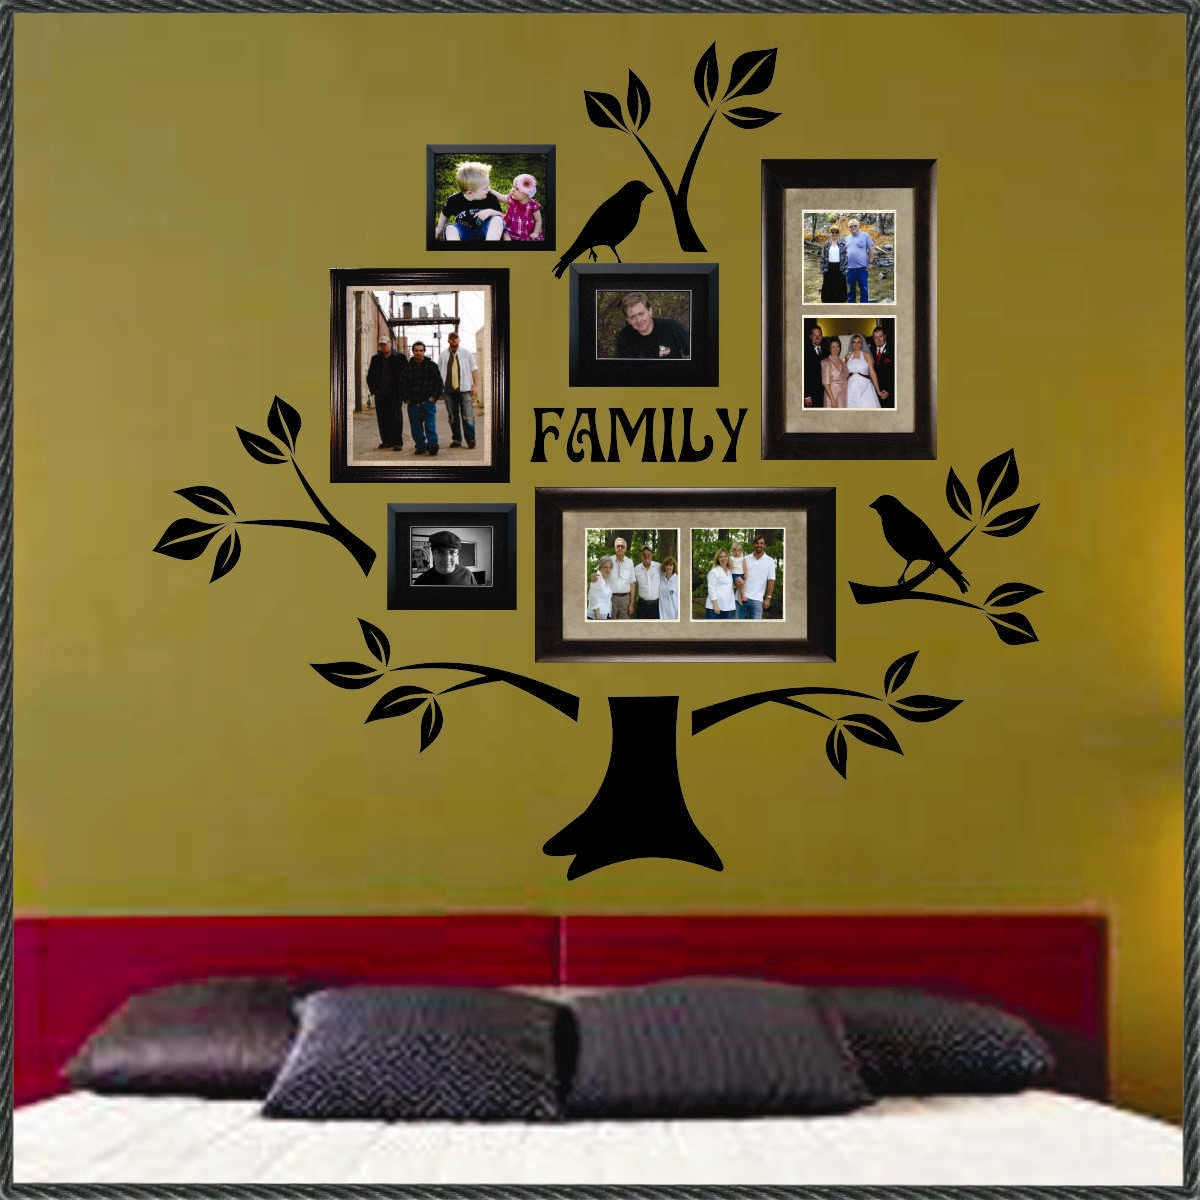 Walls That Talk: Vinyl Family Tree Kit is a Bargain